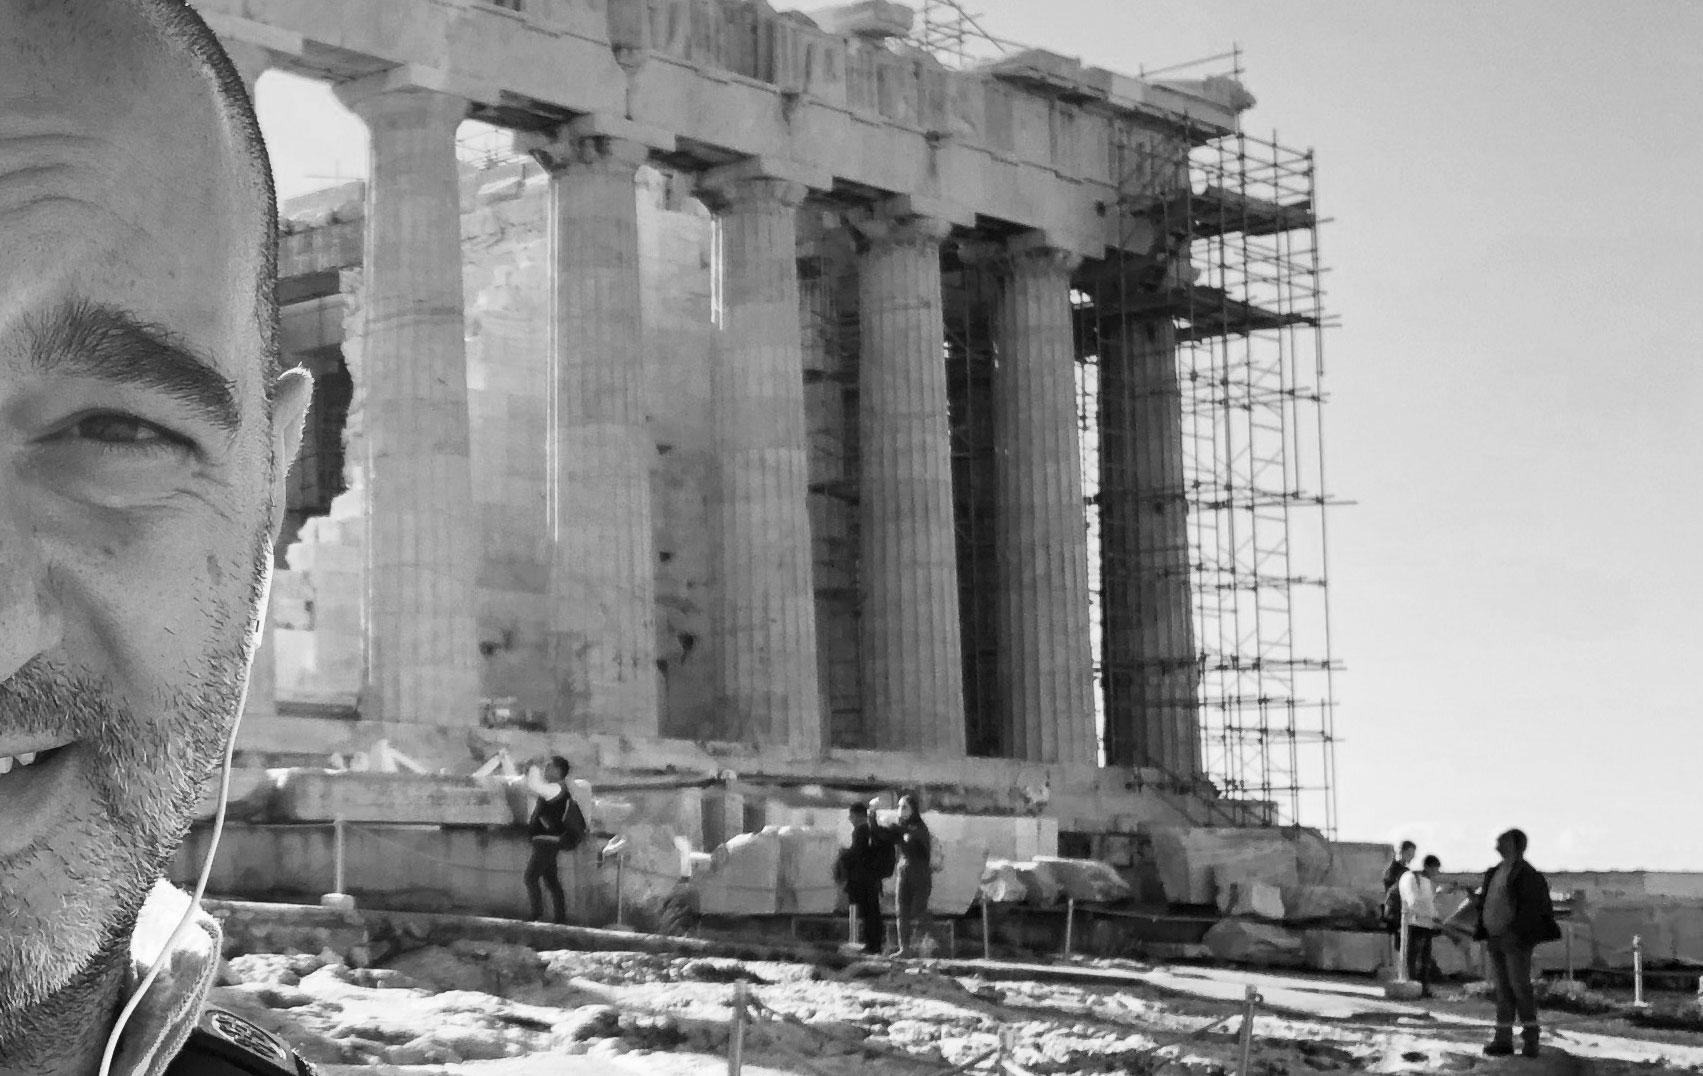 Me. Athens, January 2019